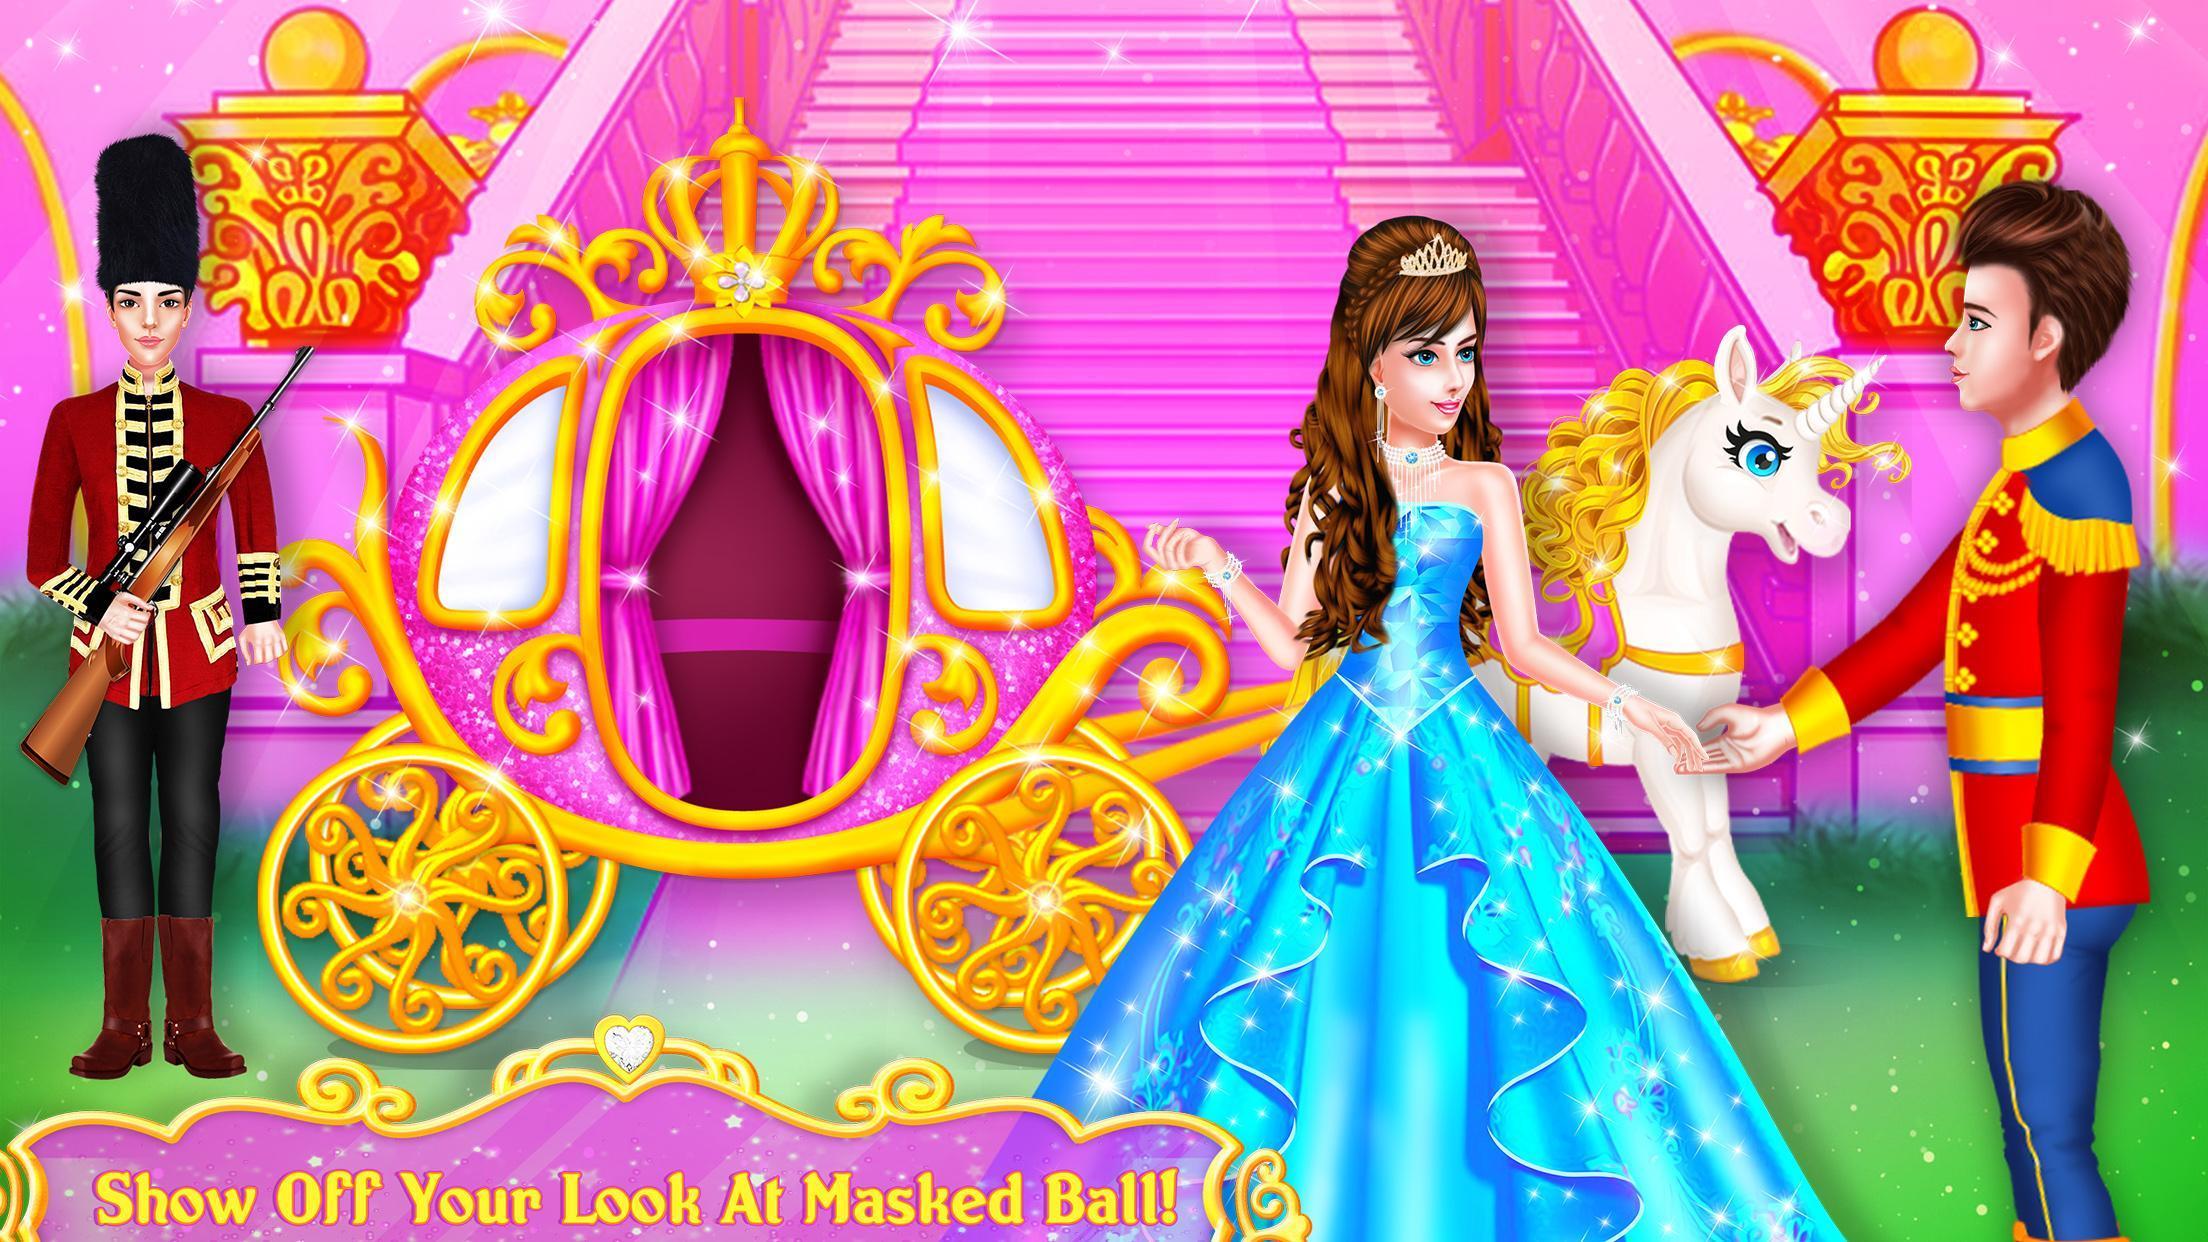 Prince Charles Love Crush Story 1.7 Screenshot 5